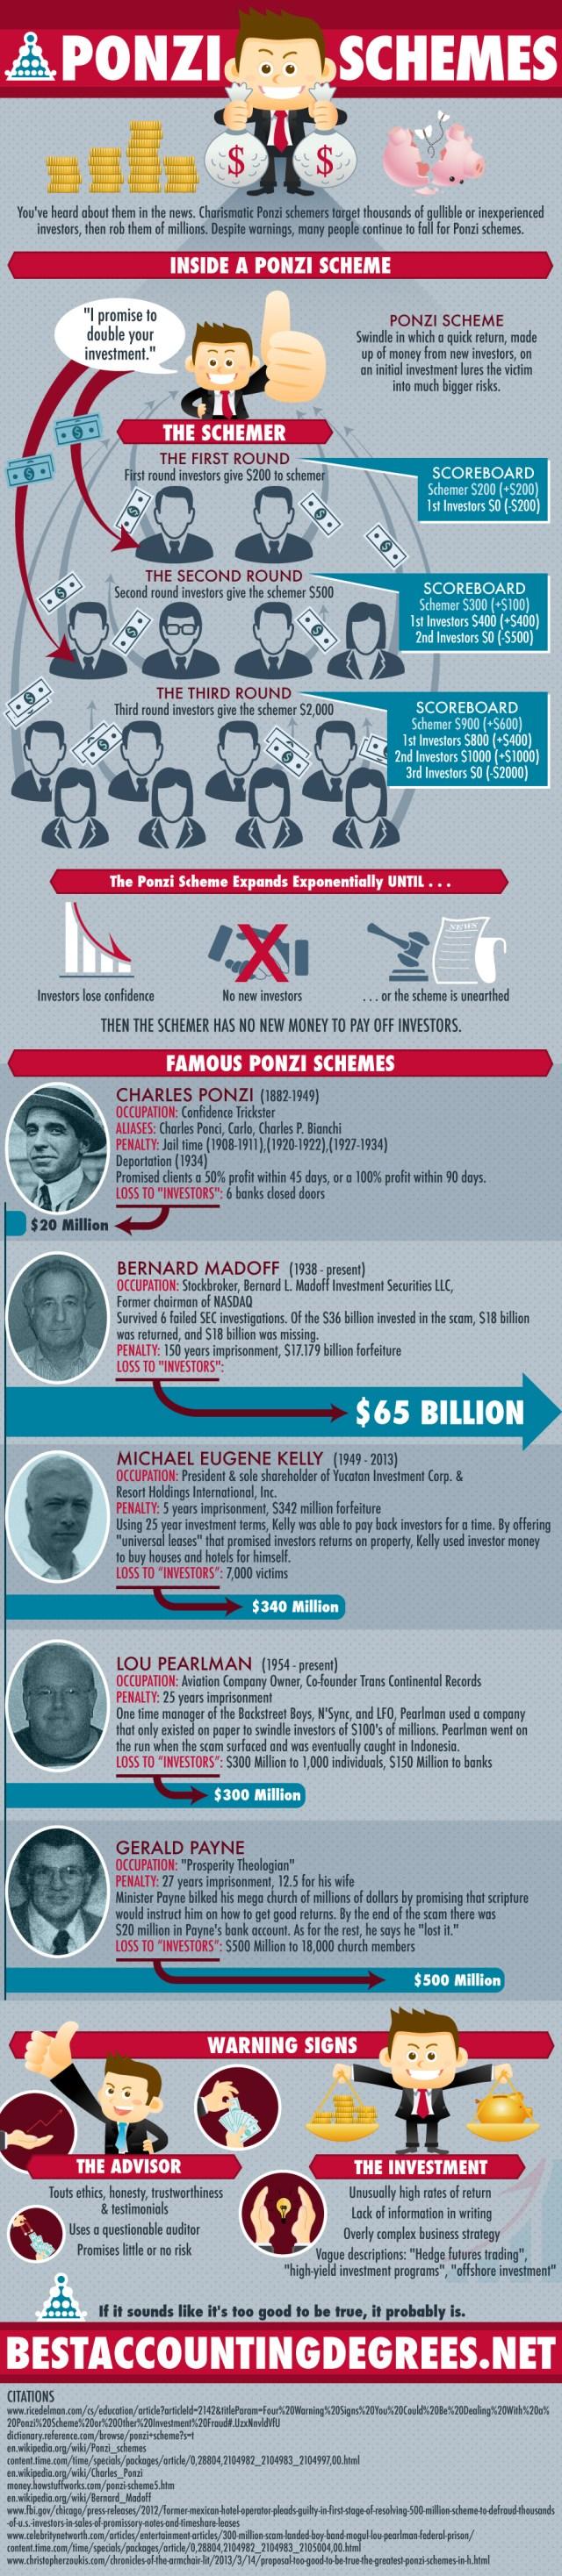 Ponzi Schemes